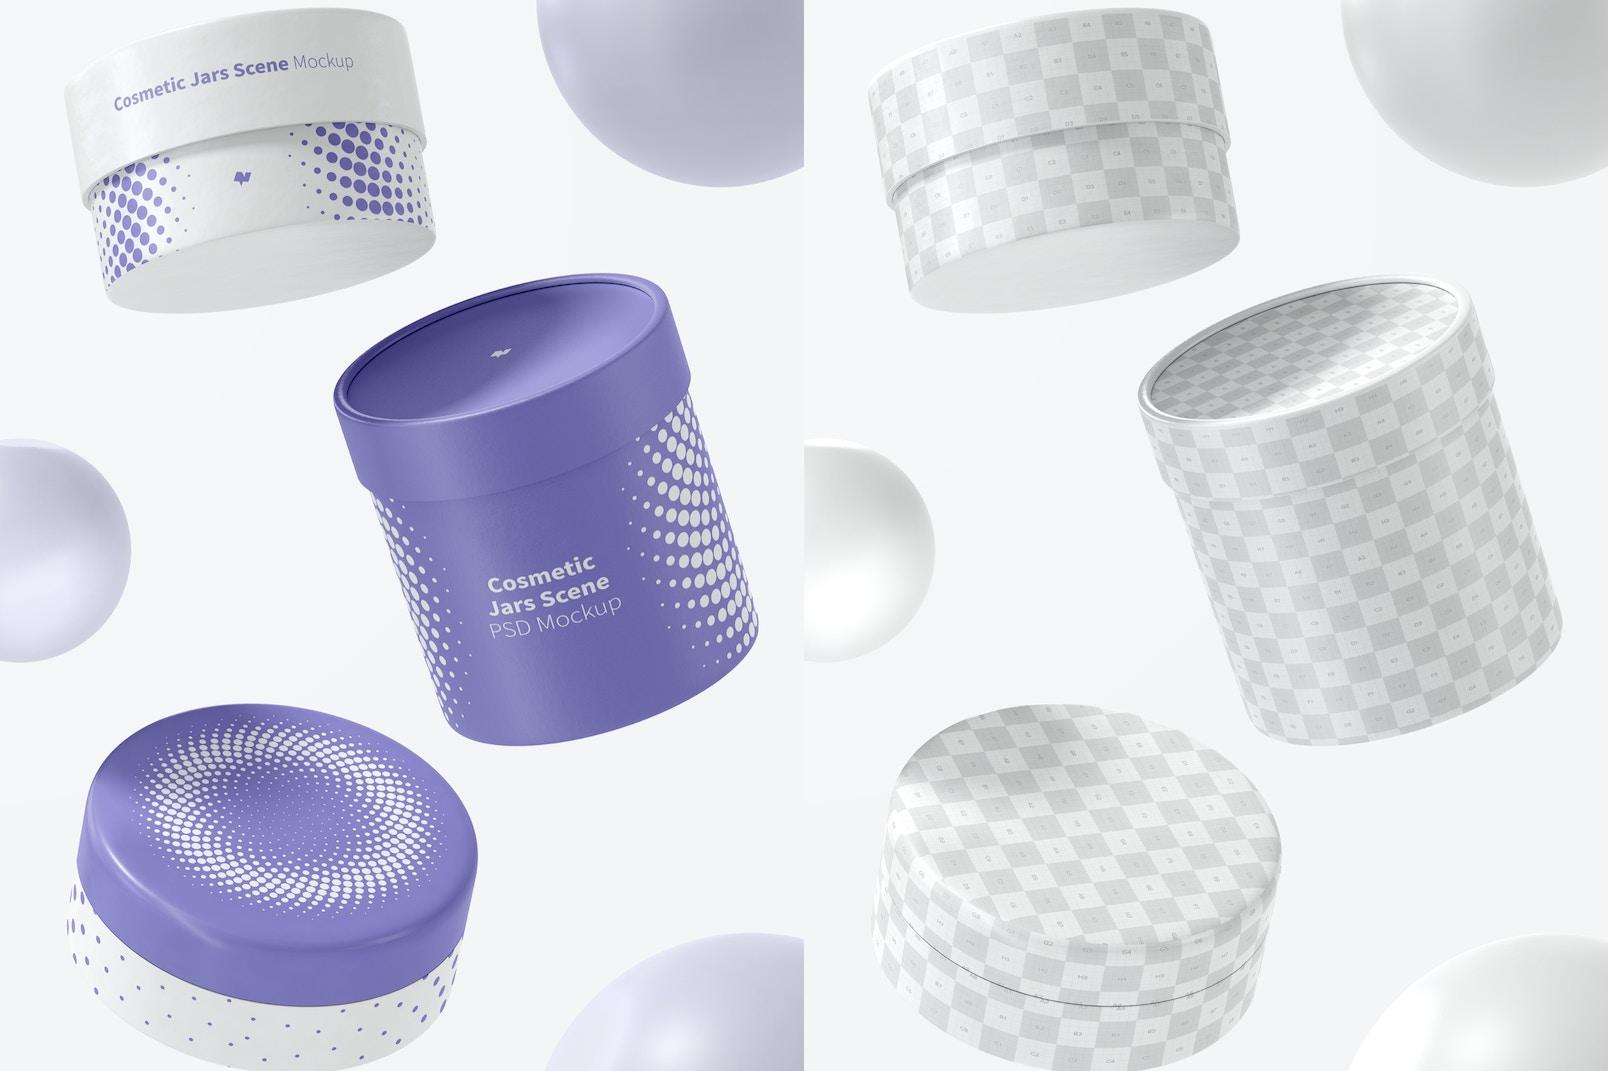 Cosmetic Jars Scene Mockup, Falling